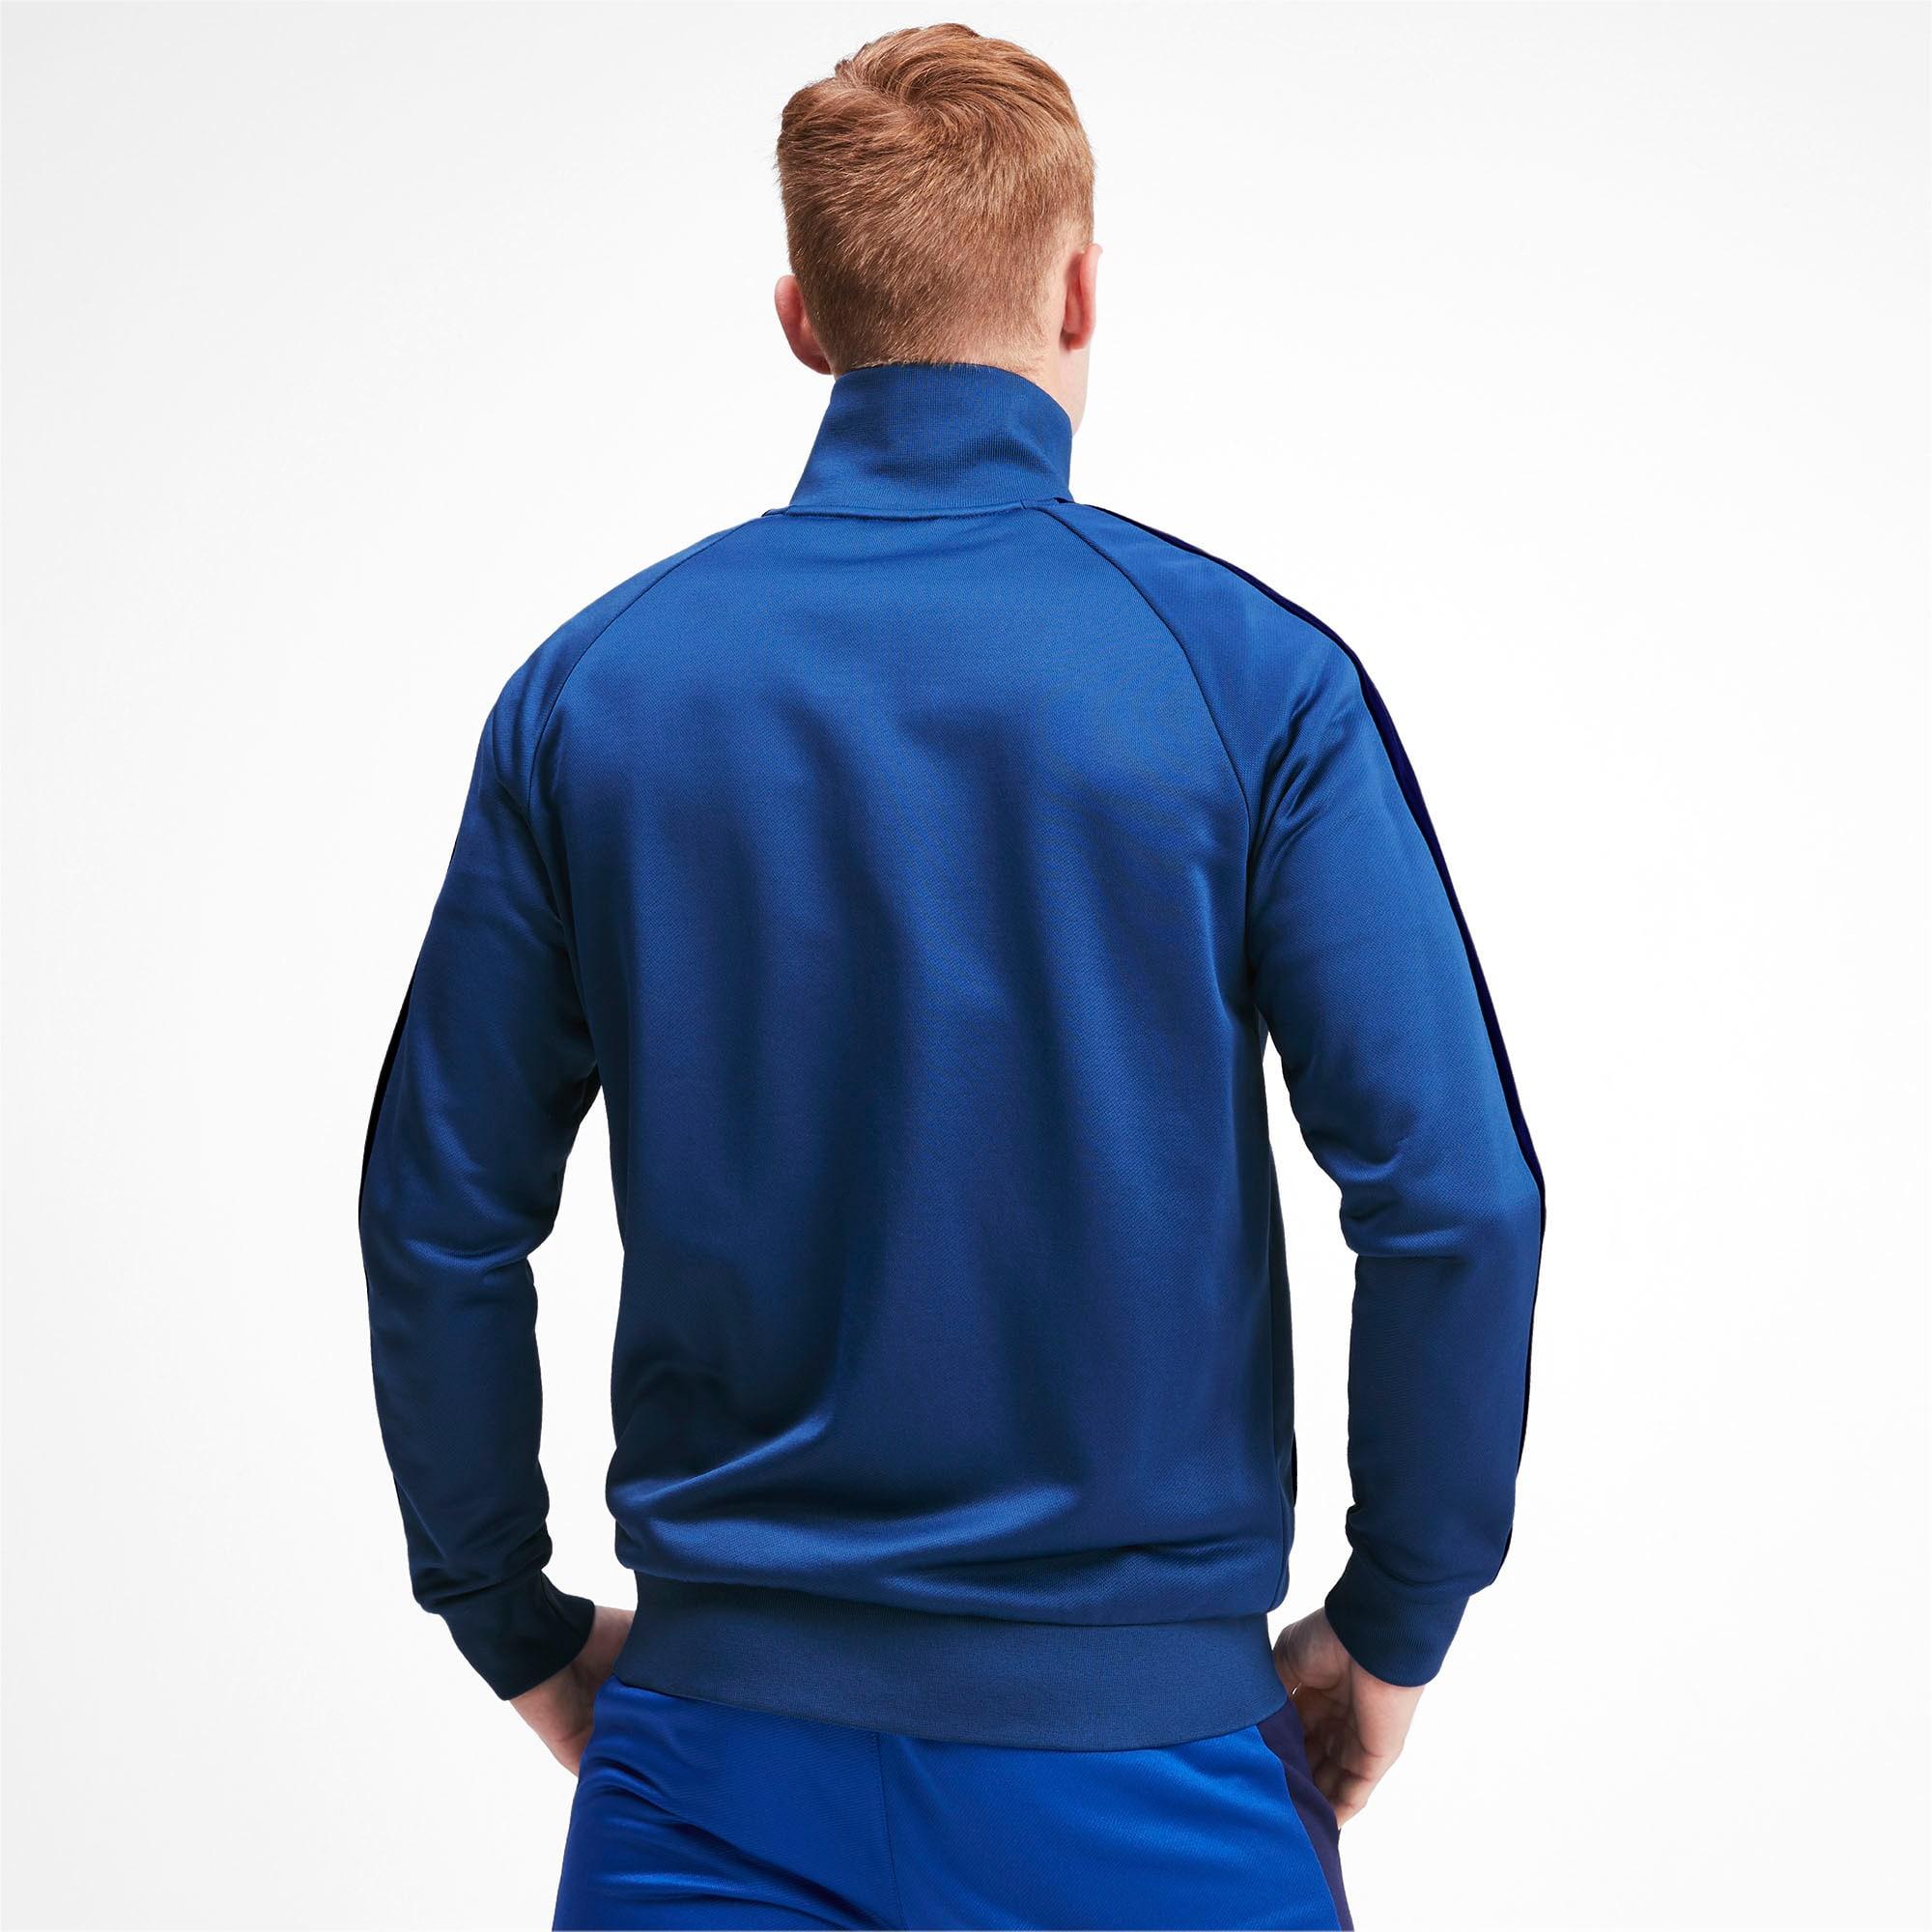 Thumbnail 3 of Iconic T7 Men's Track Jacket, Galaxy Blue, medium